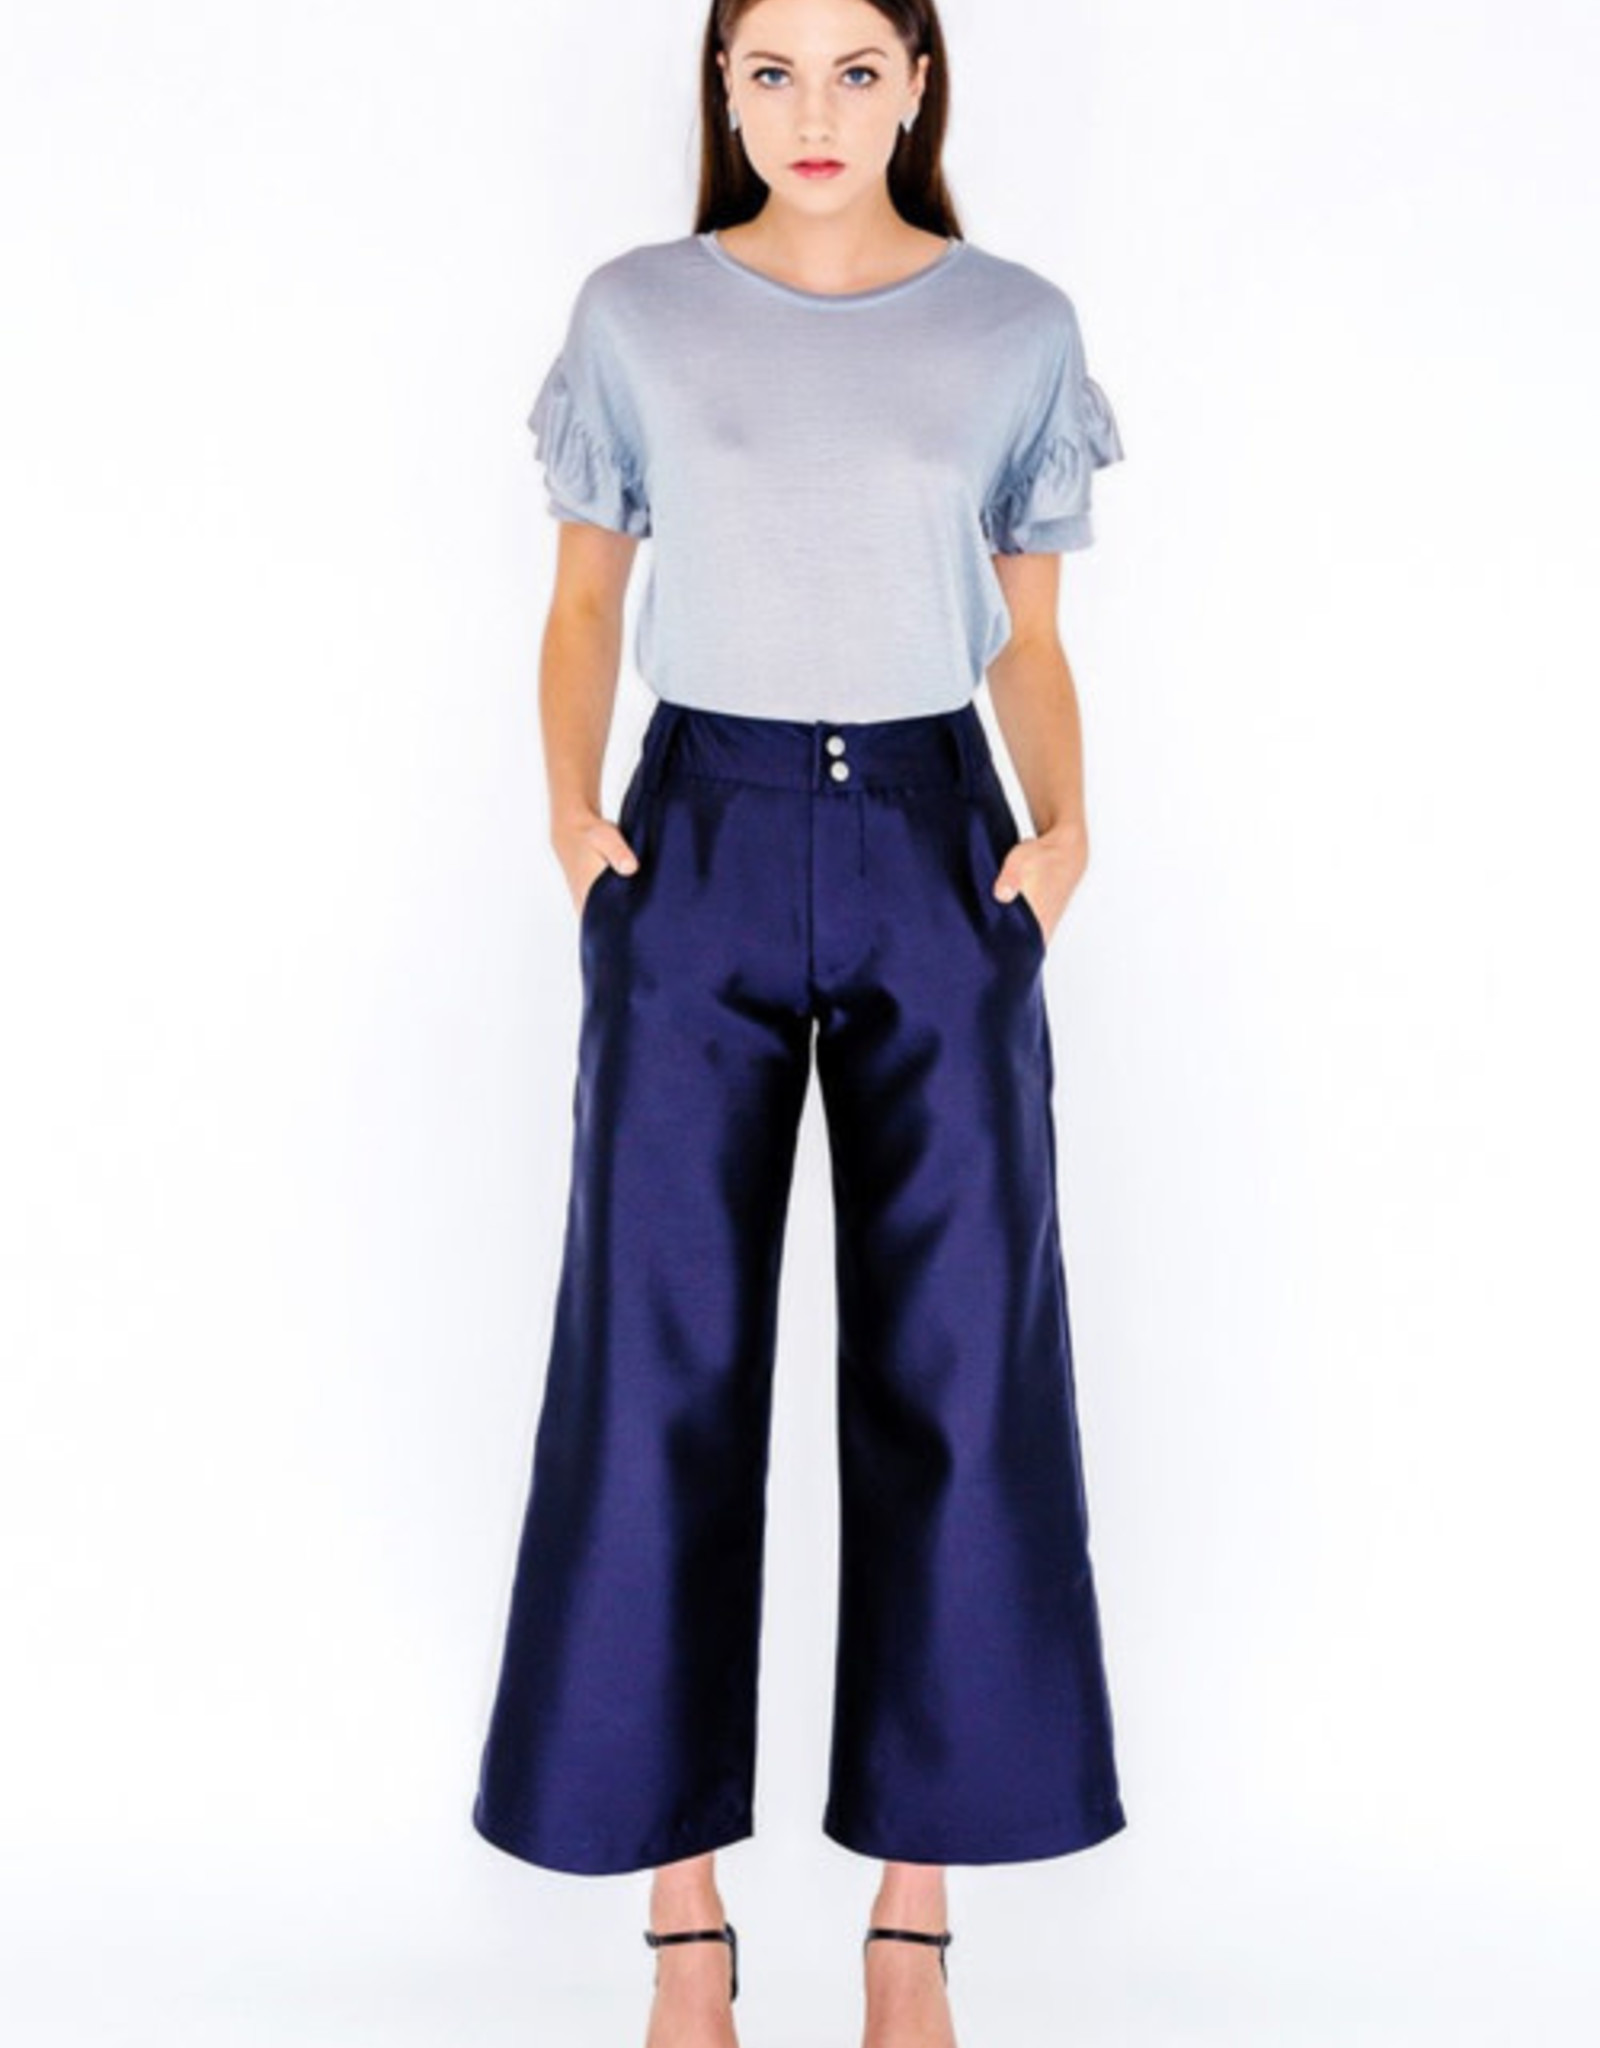 Papercut Papercut Patterns - Nagoya Pants/Shorts- xxs-xl